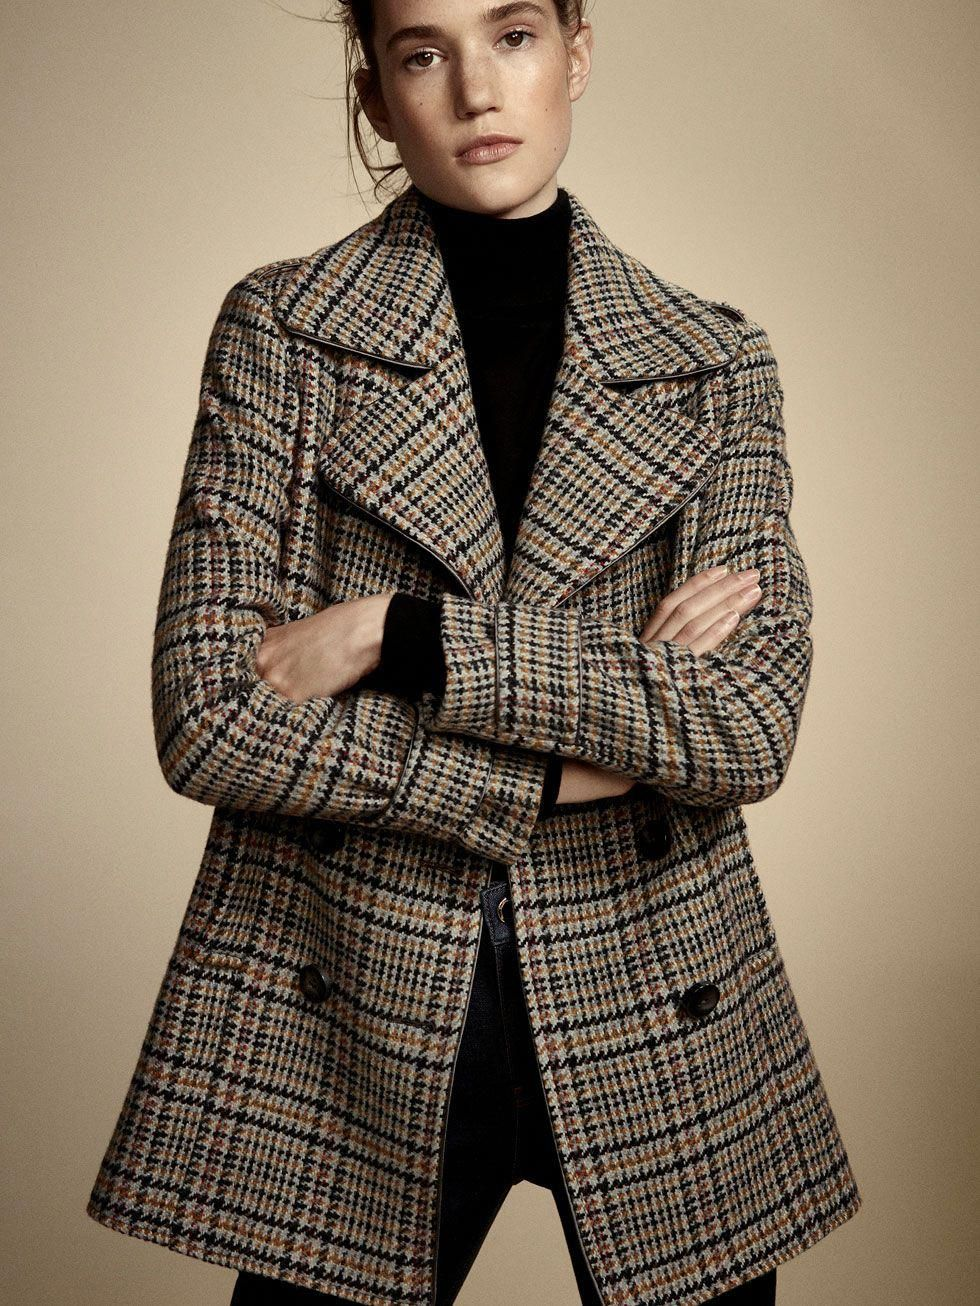 Fall Winter 2017 Women S Checked Wool Coat At Massimo Dutti For 199 Effortless Elegance Women Scoats Plaid Jacket Women Fashion Blouse Jacket